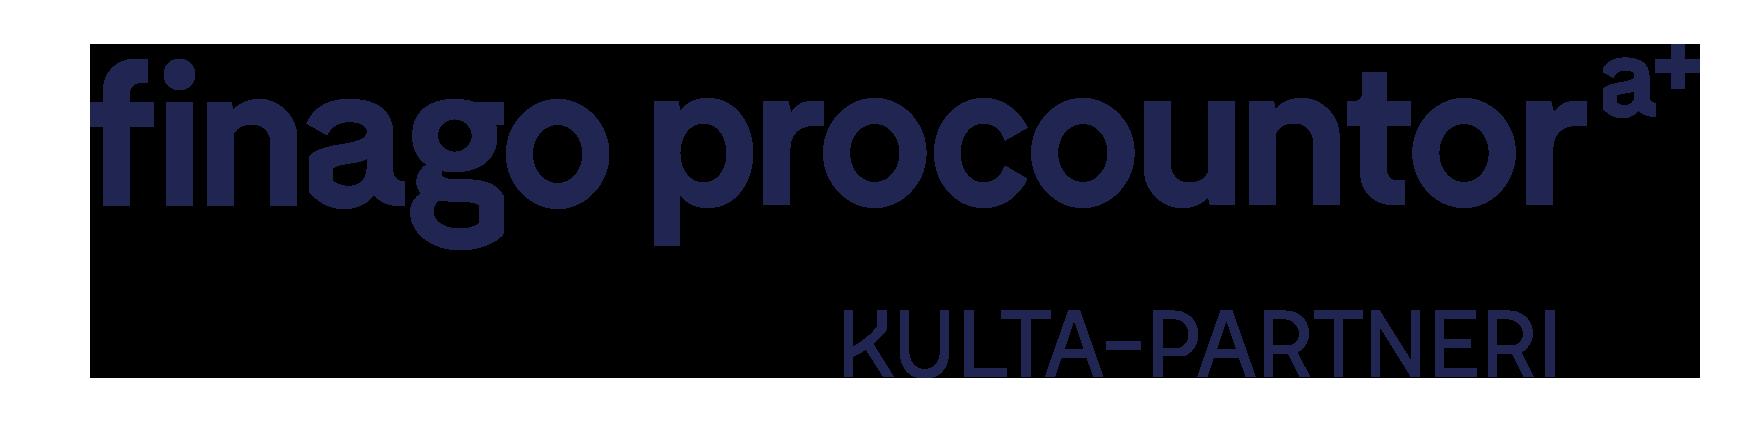 Finago Procountor Kulta-partneri -logo